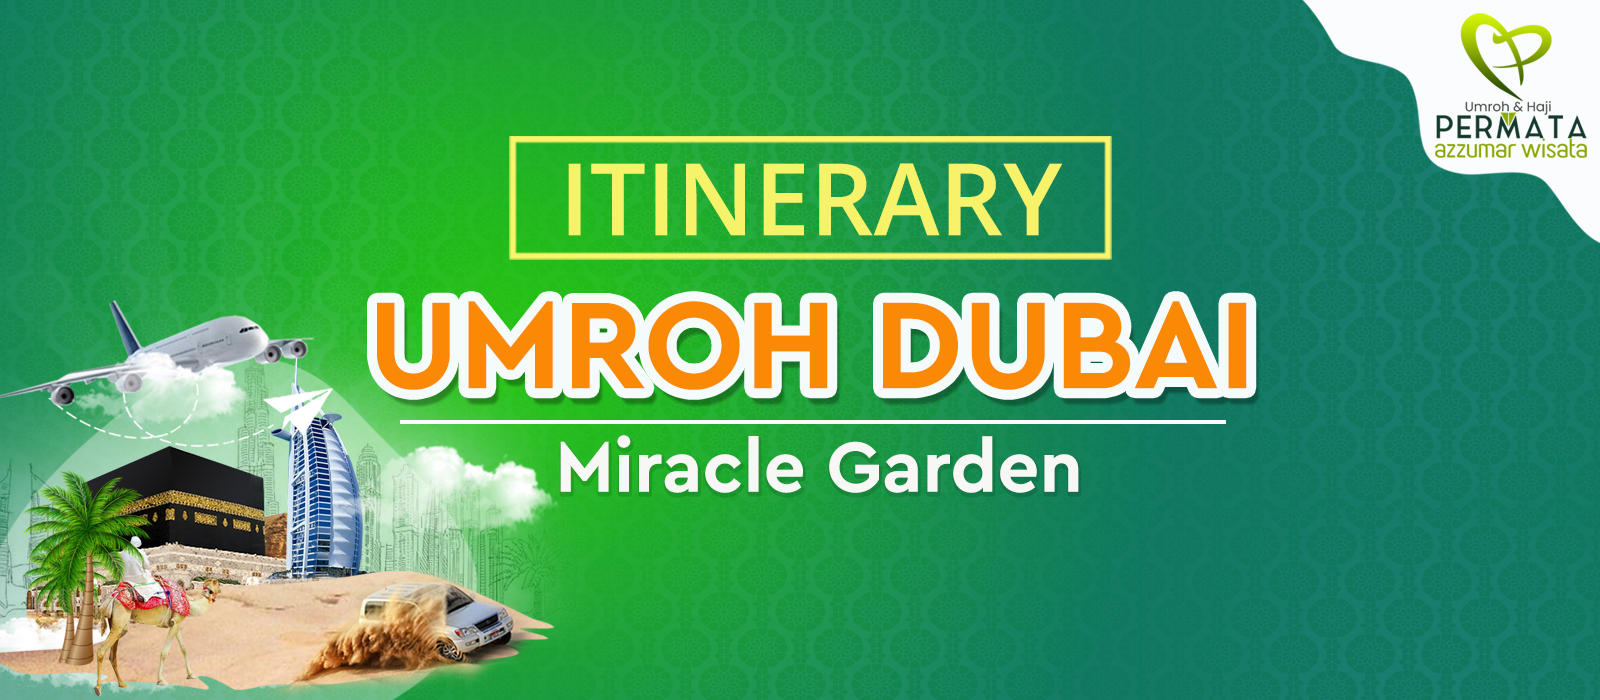 program Umroh plus dubai miracle garden